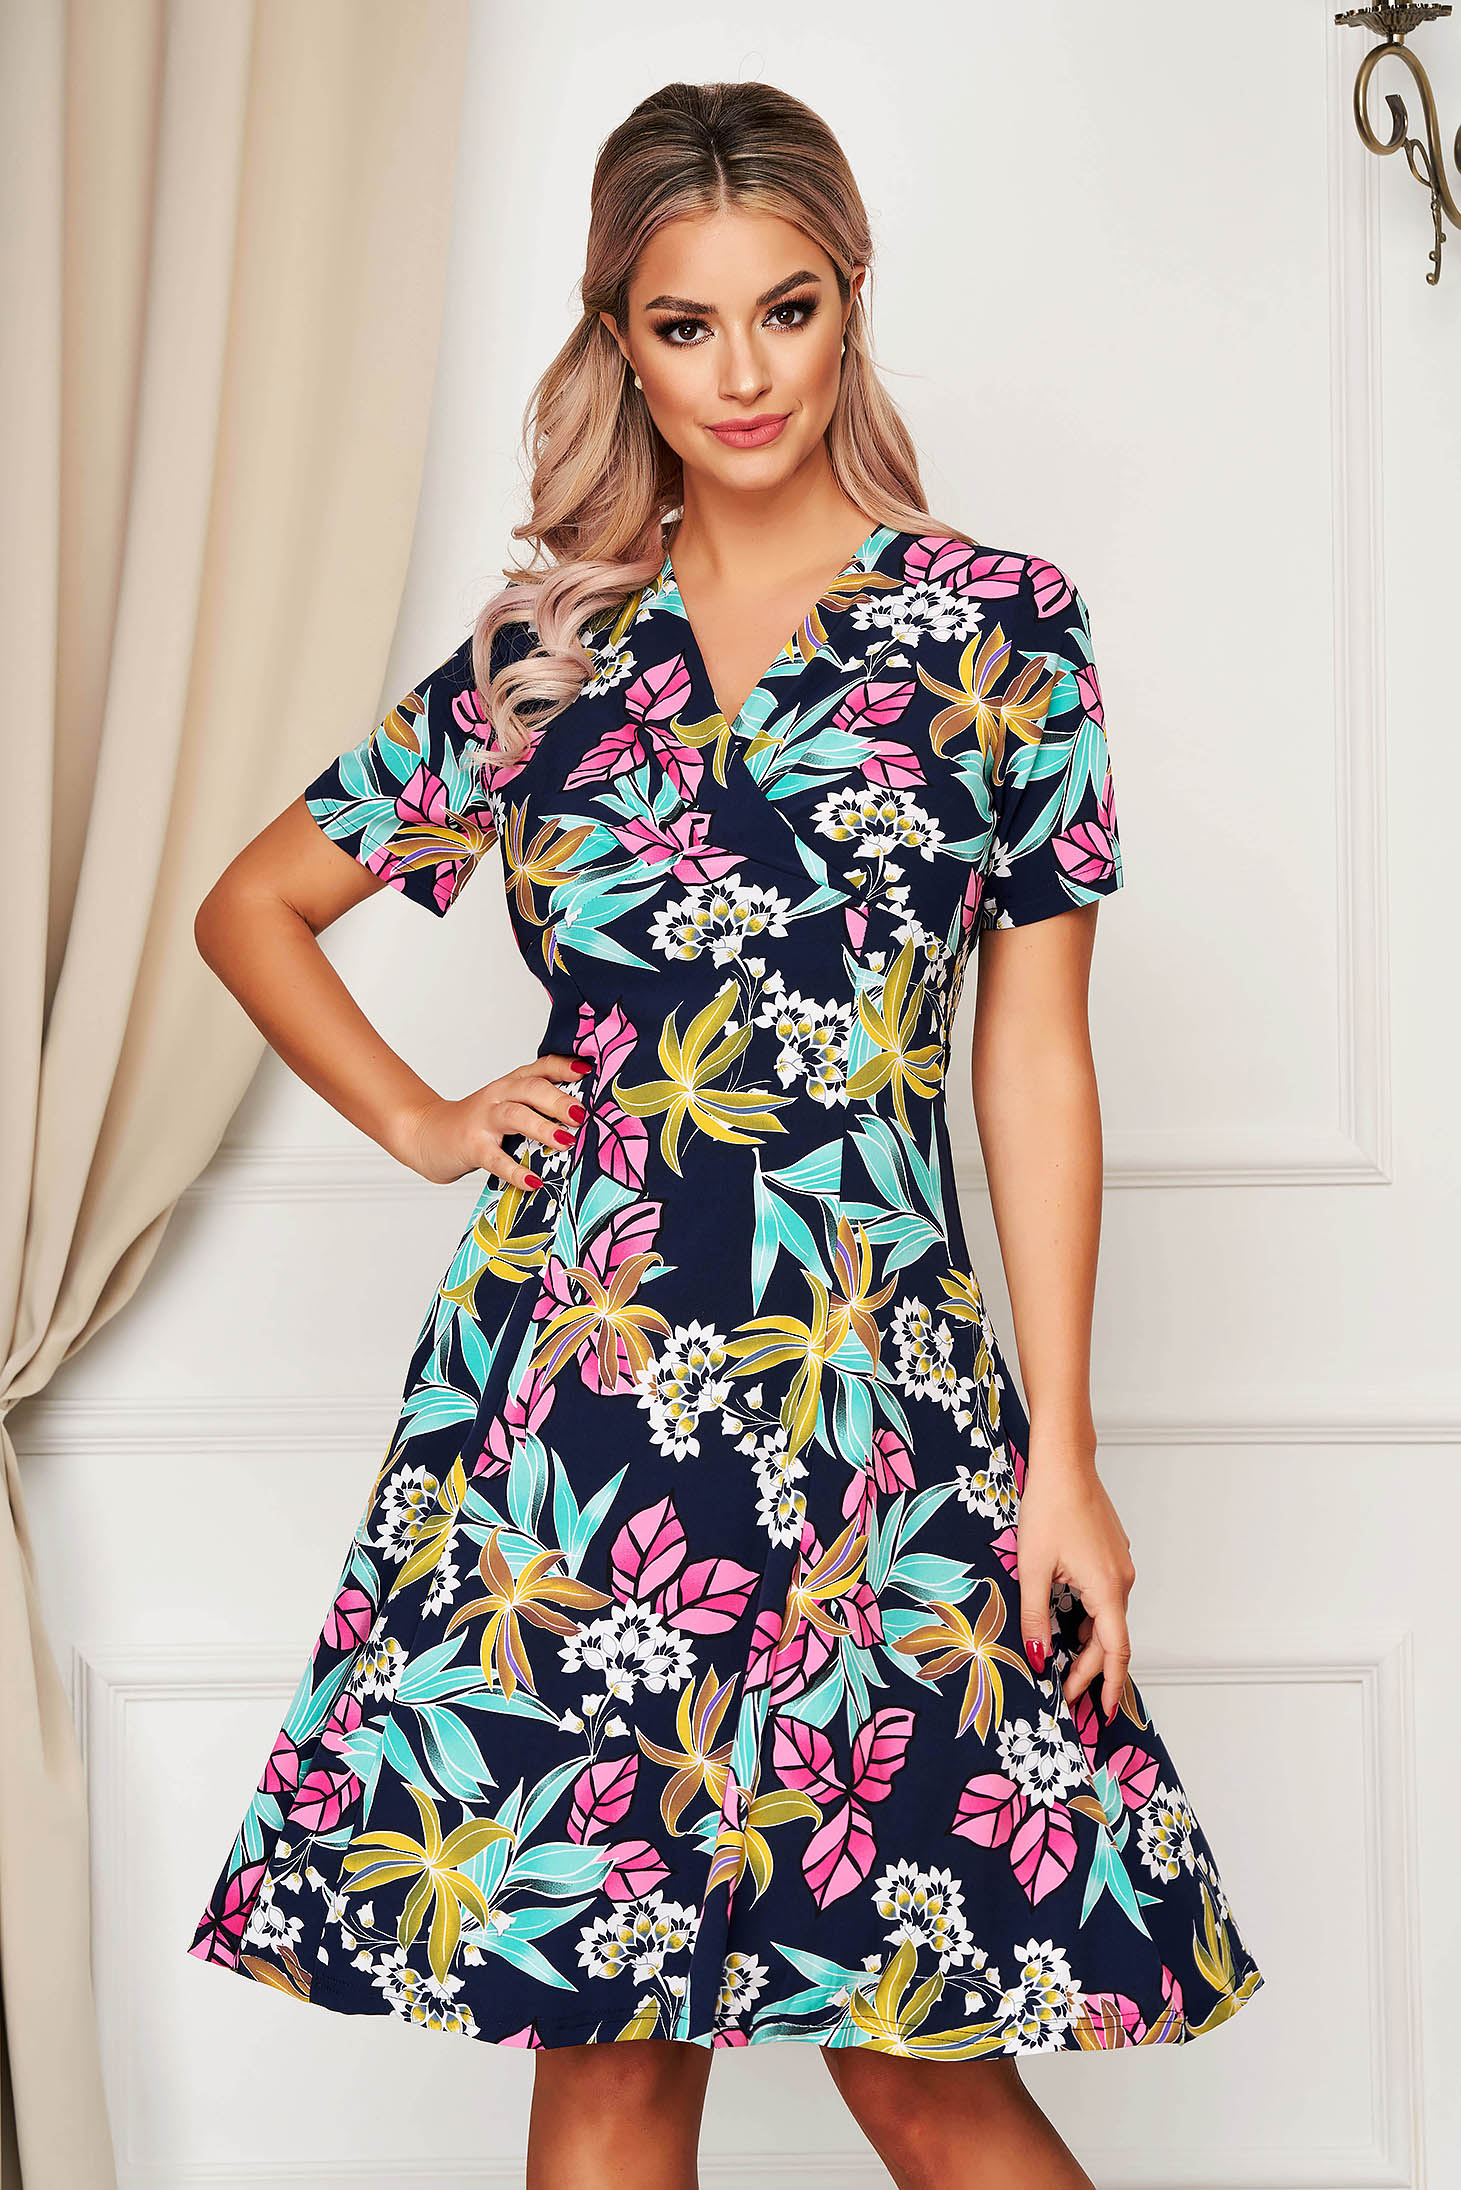 Darkblue dress daily flaring cut with v-neckline short sleeve from elastic fabric